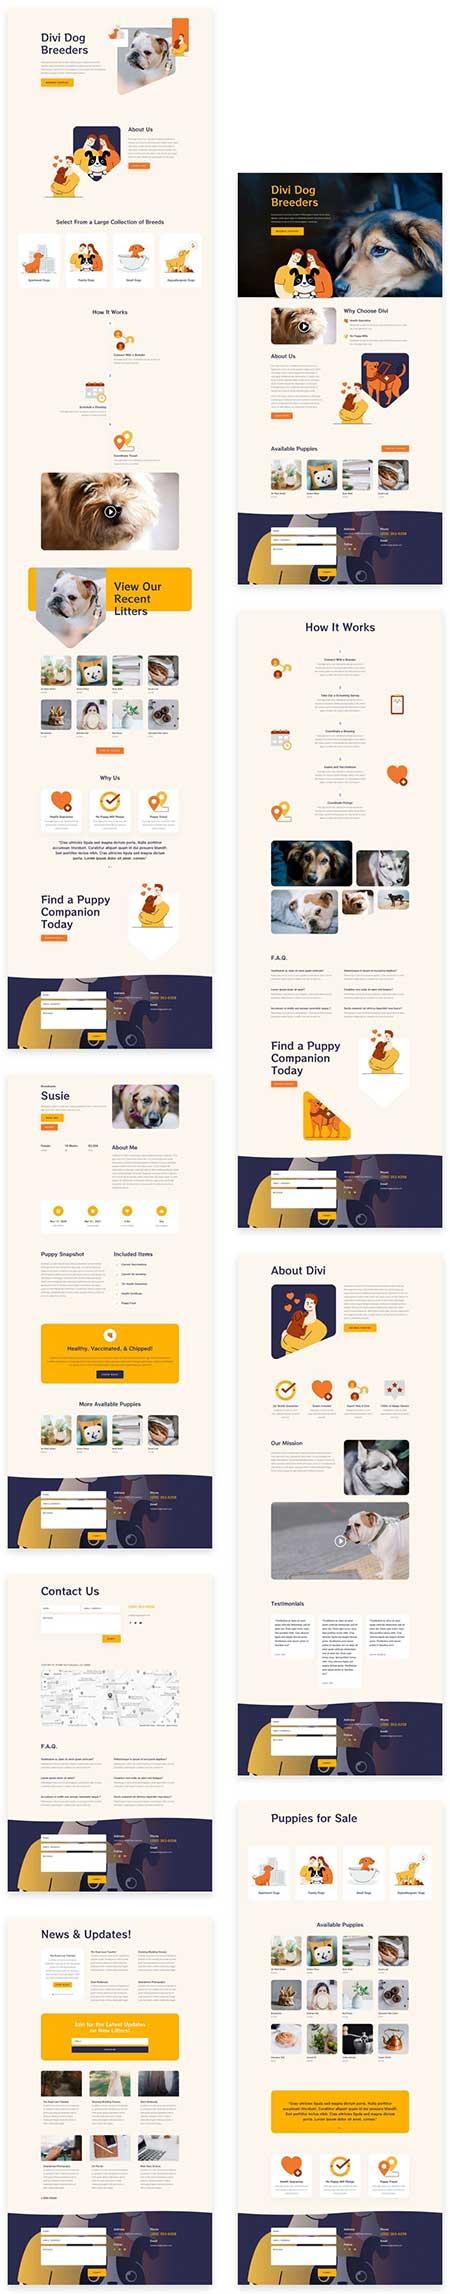 Divi dog breeder website templates